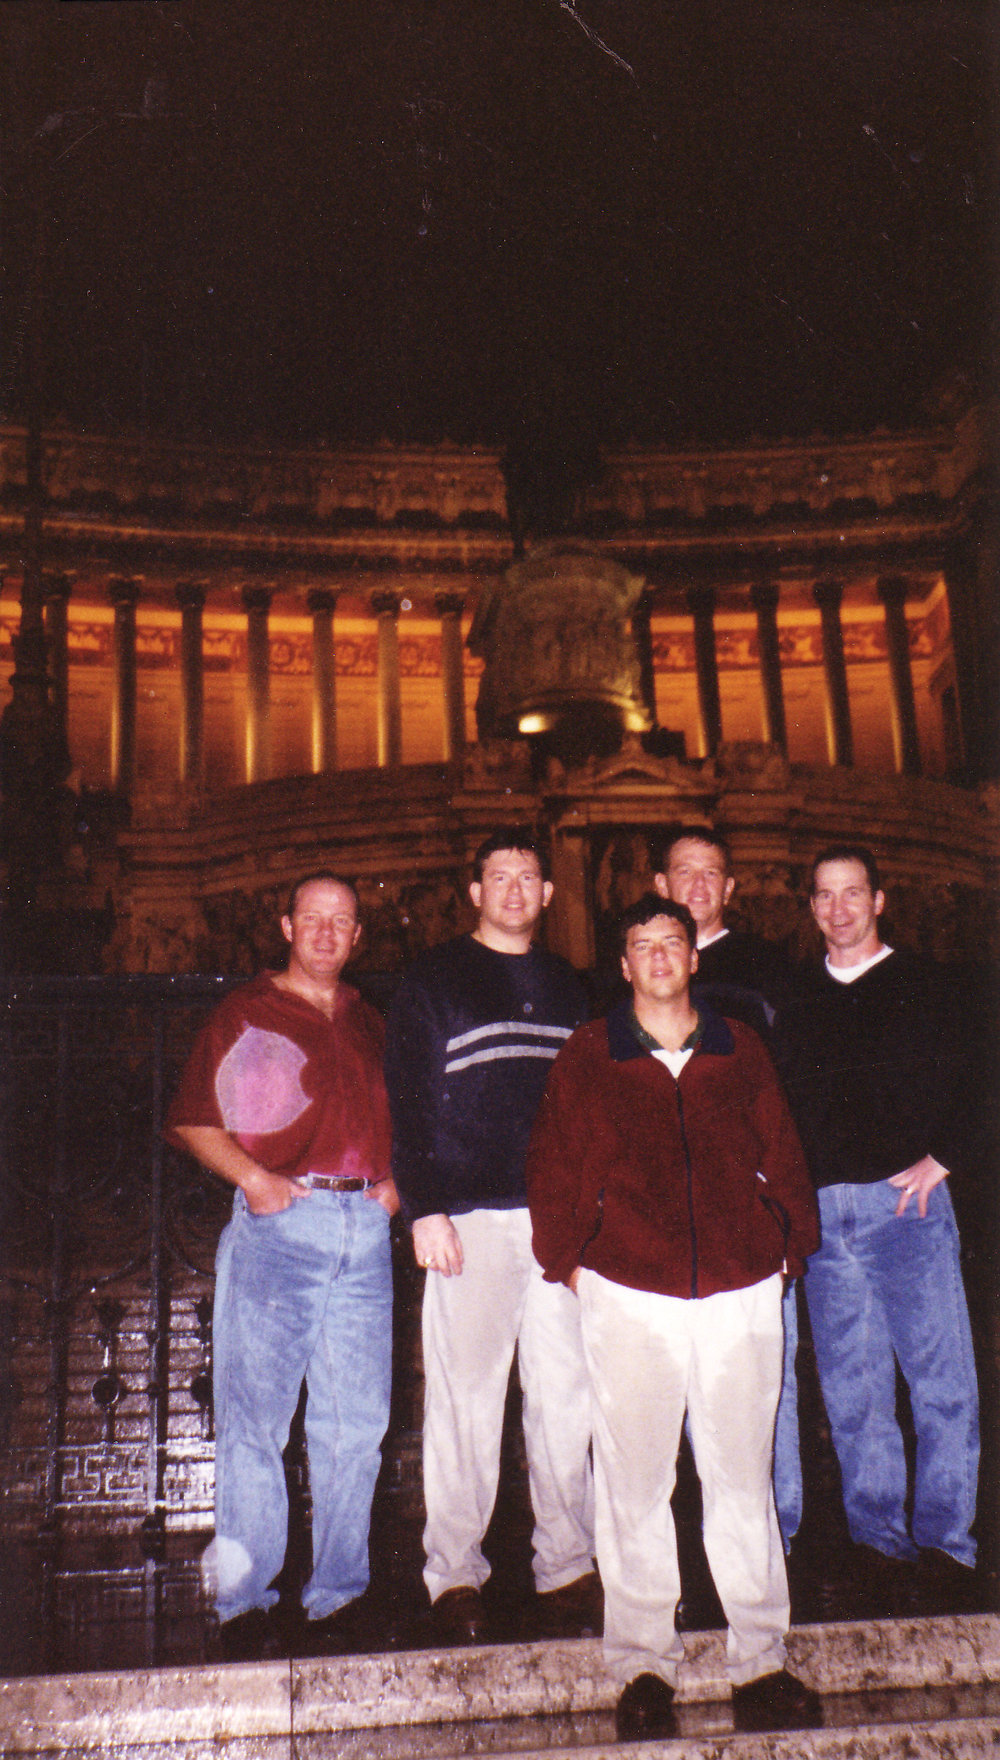 Piazza Venezia - Rome Italy